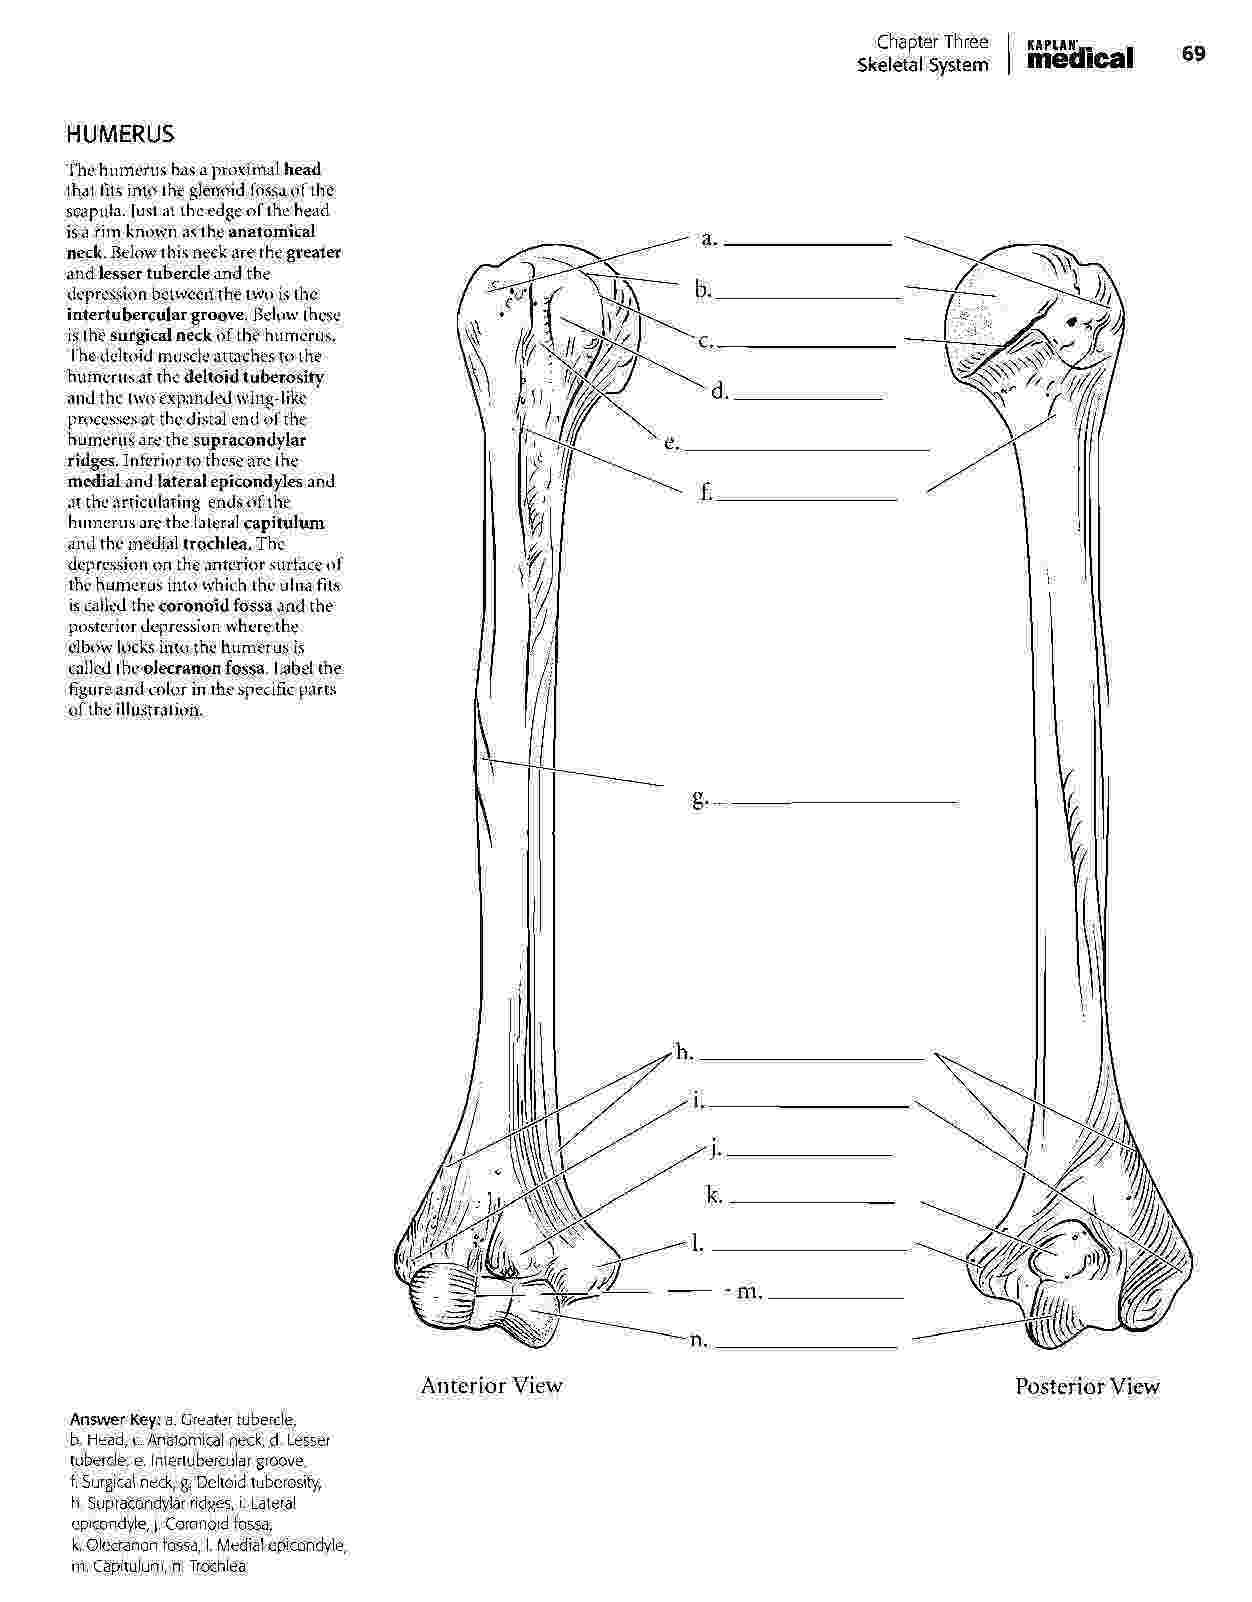 anatomy coloring book free free printable human anatomy coloring pages 2 free coloring free book anatomy